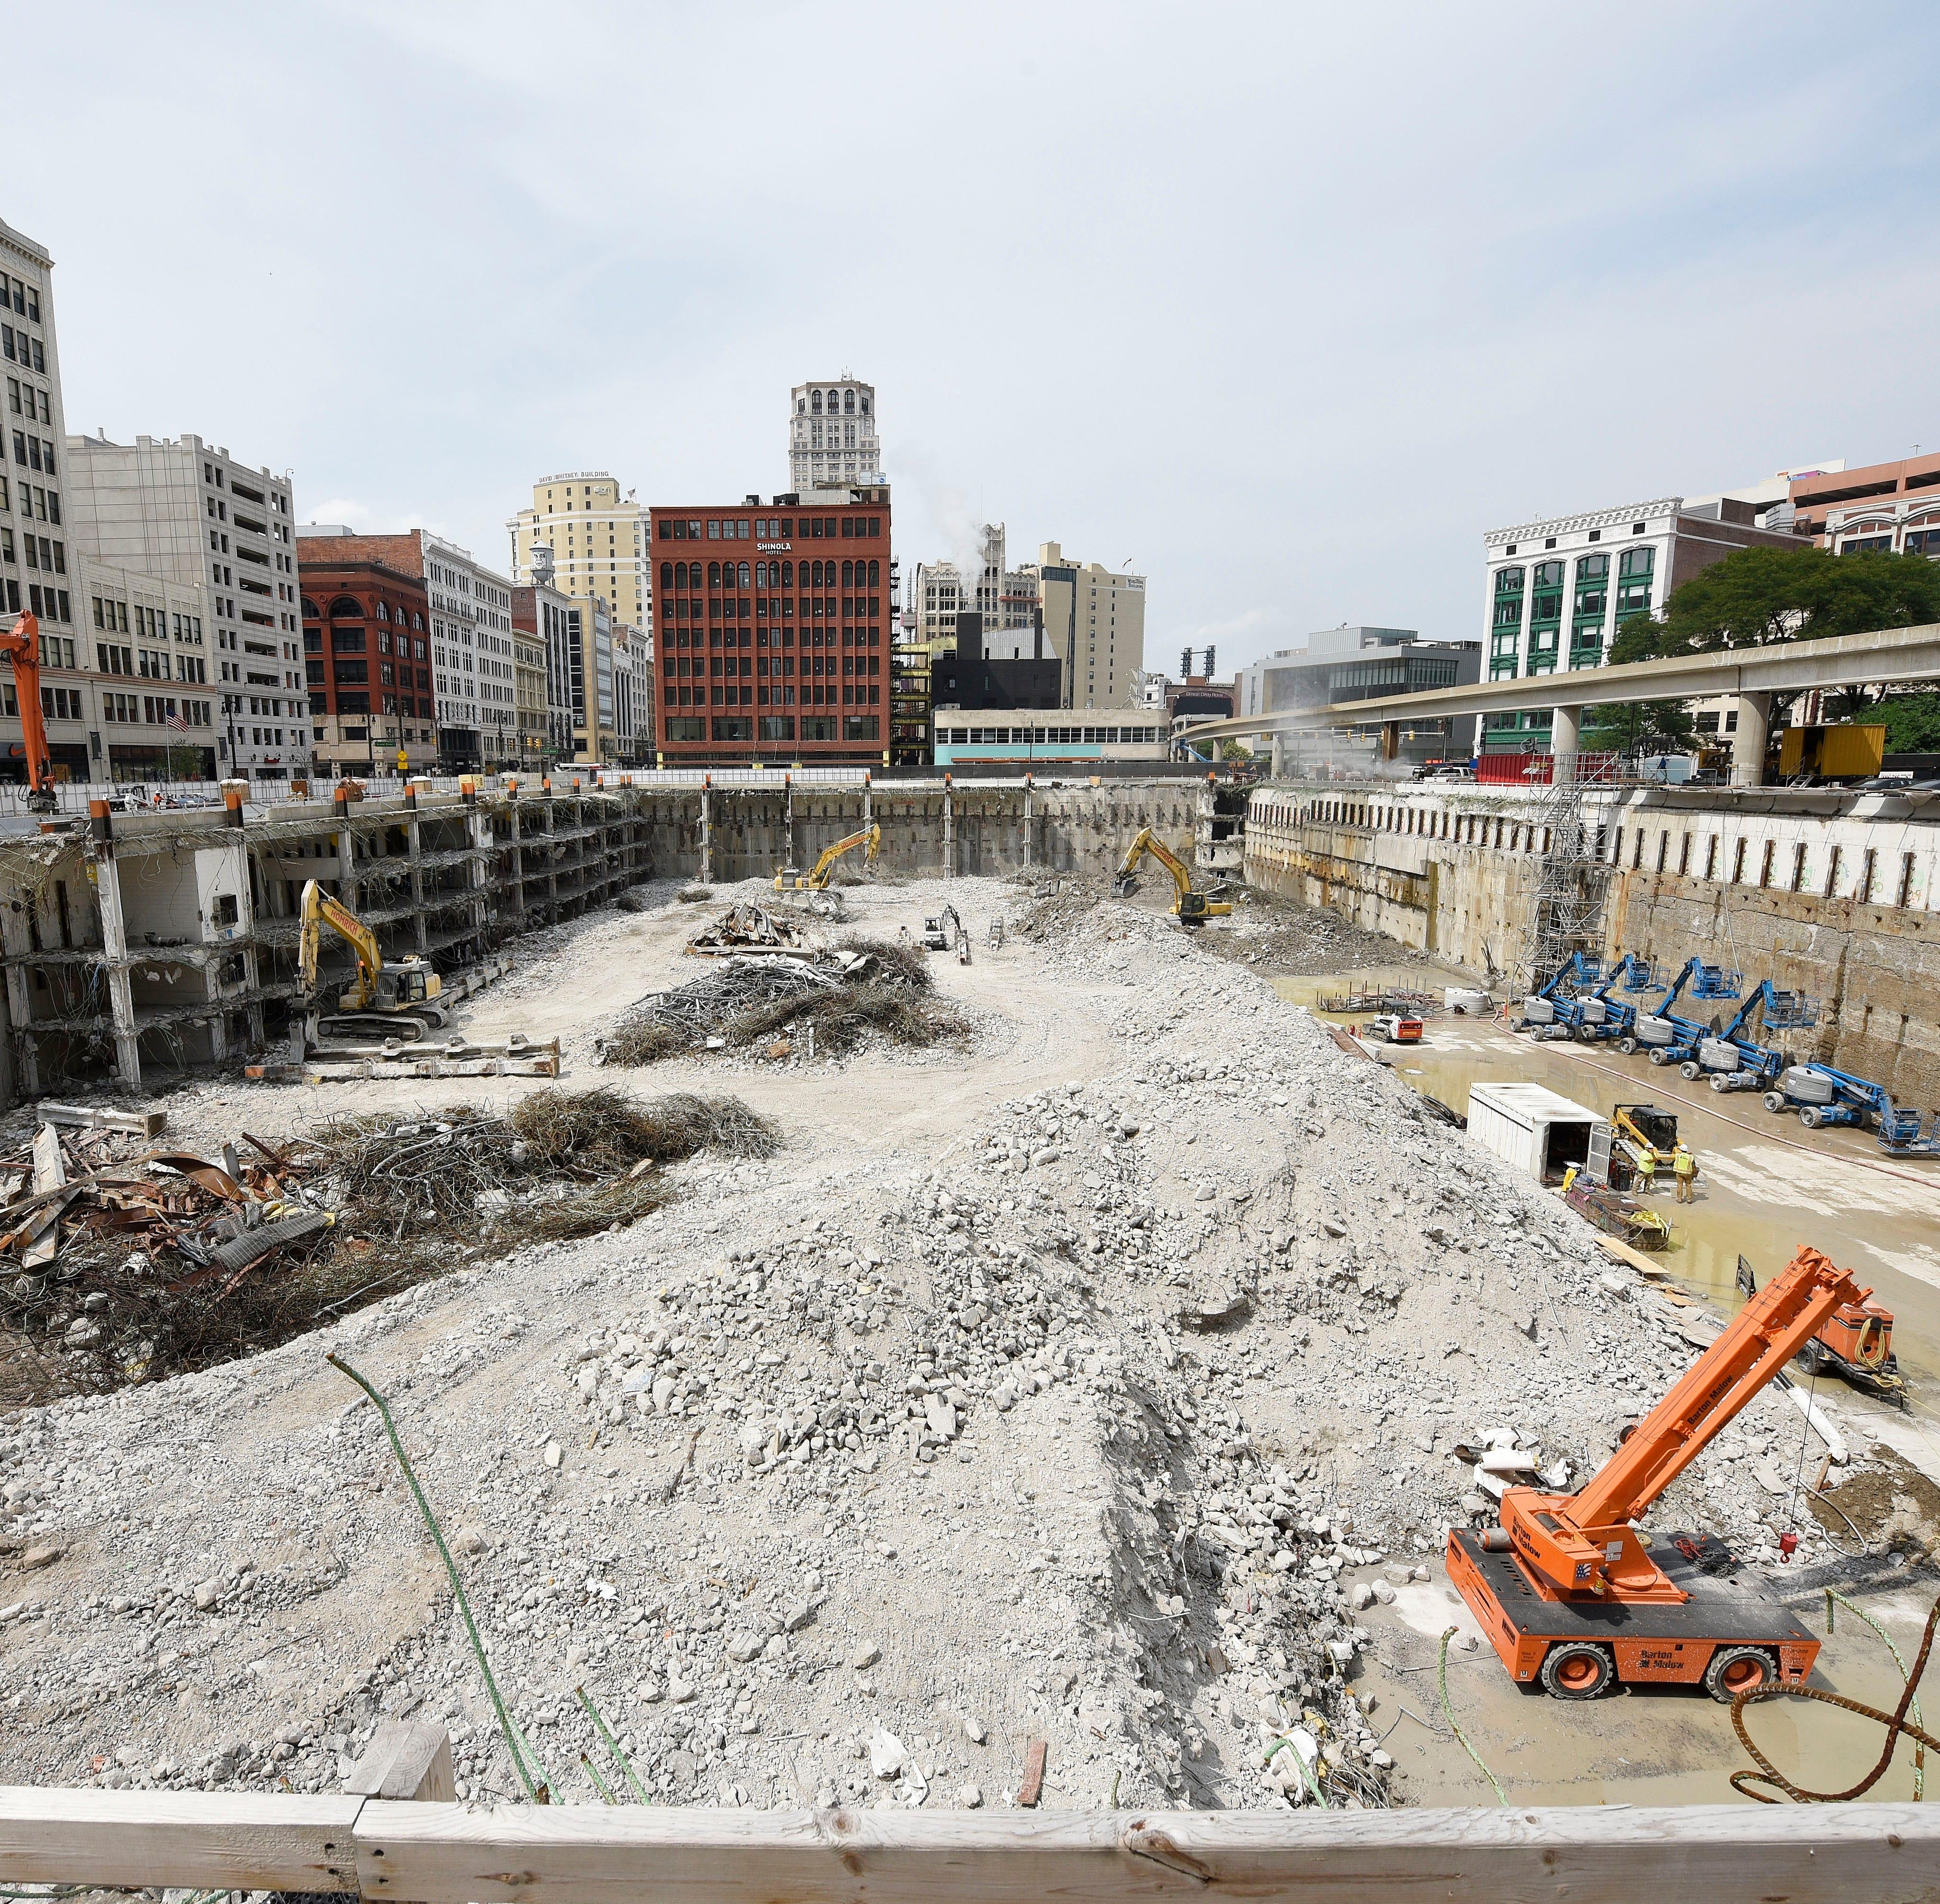 Former Detroit Hudson site demo on schedule